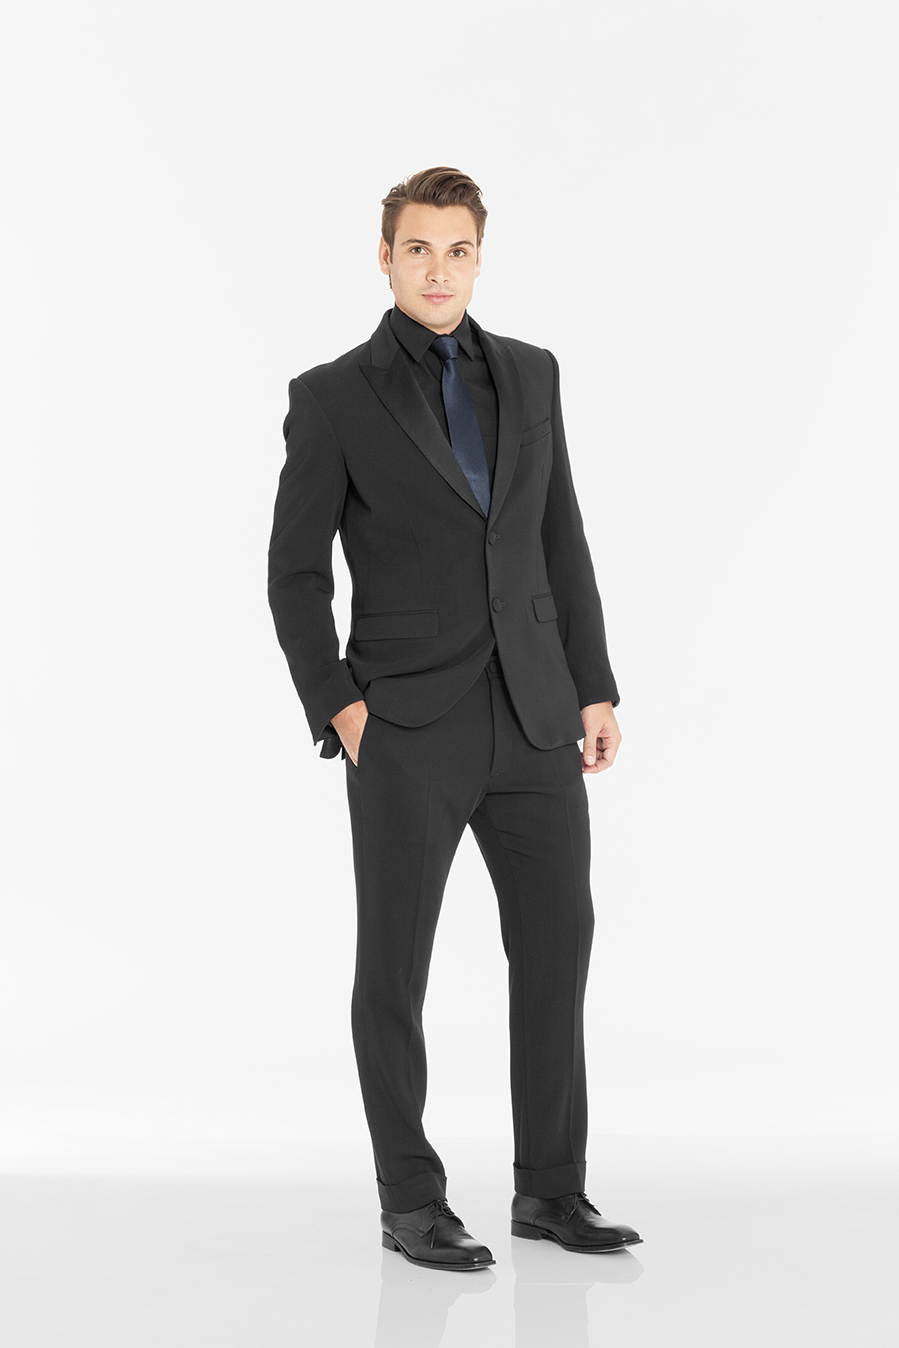 Jacket 401 Shirt 1053 Pant 214 Tie 1422